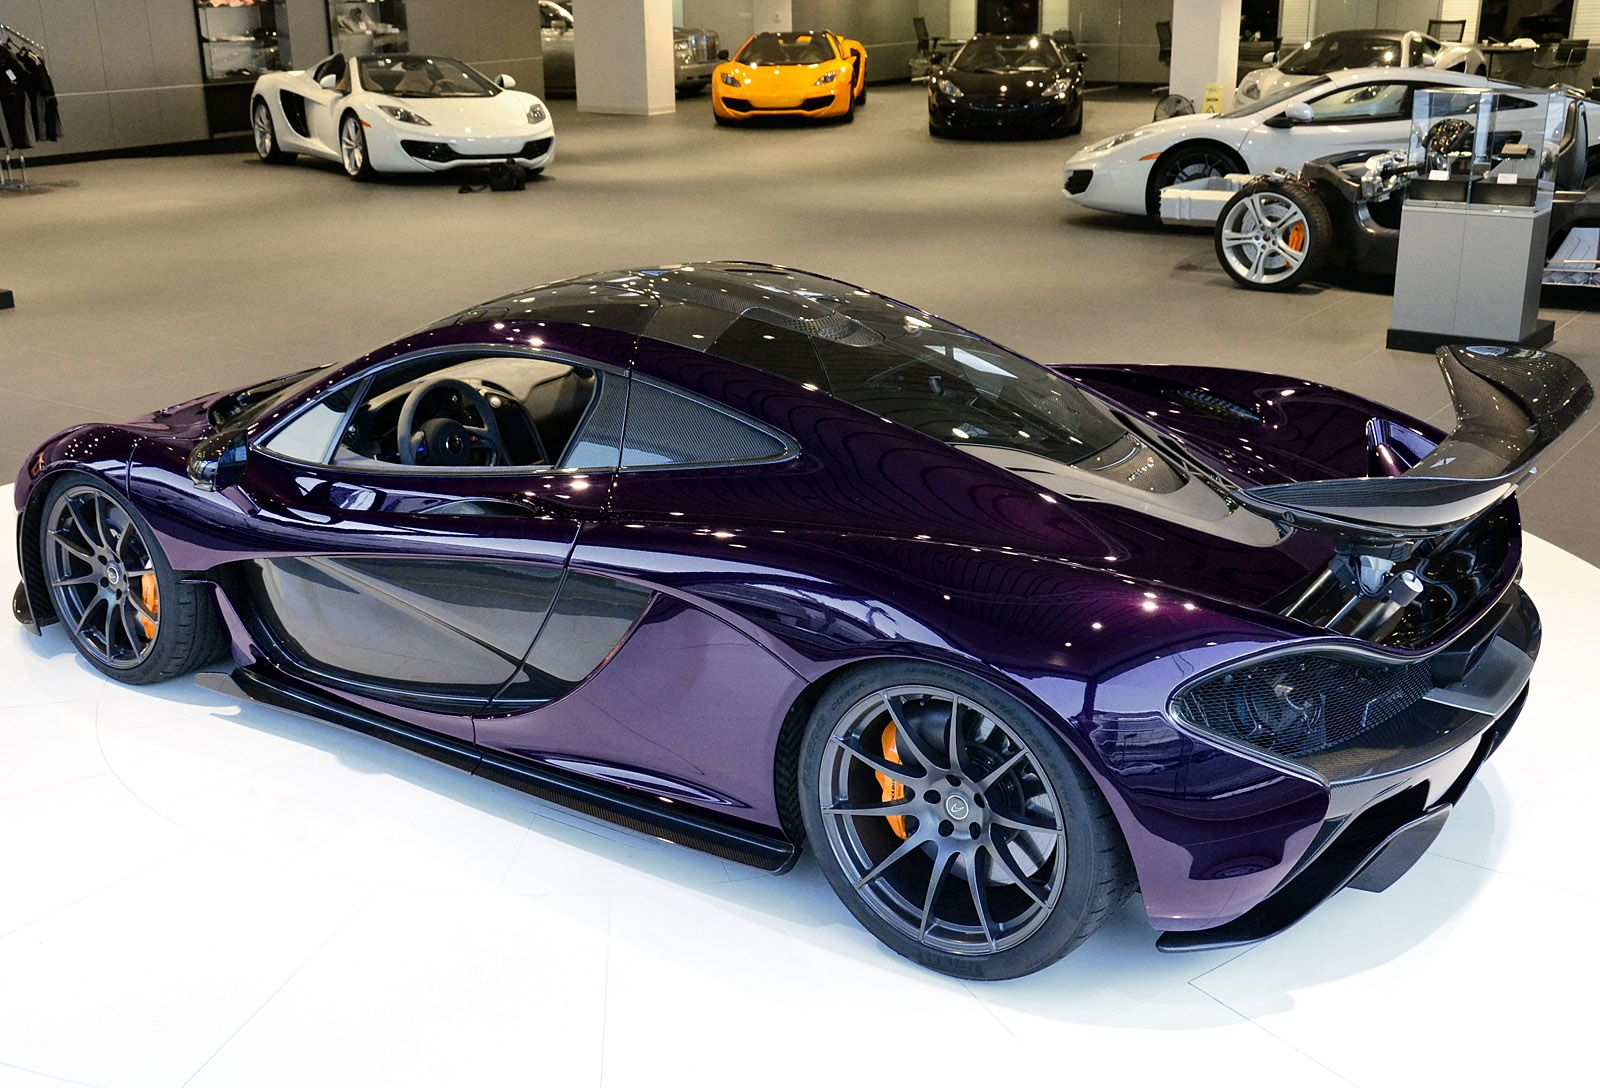 Mclaren P1 In Amethyst Black A Couple Of 12c S In The Background Super Cars Mclaren P1 Cars